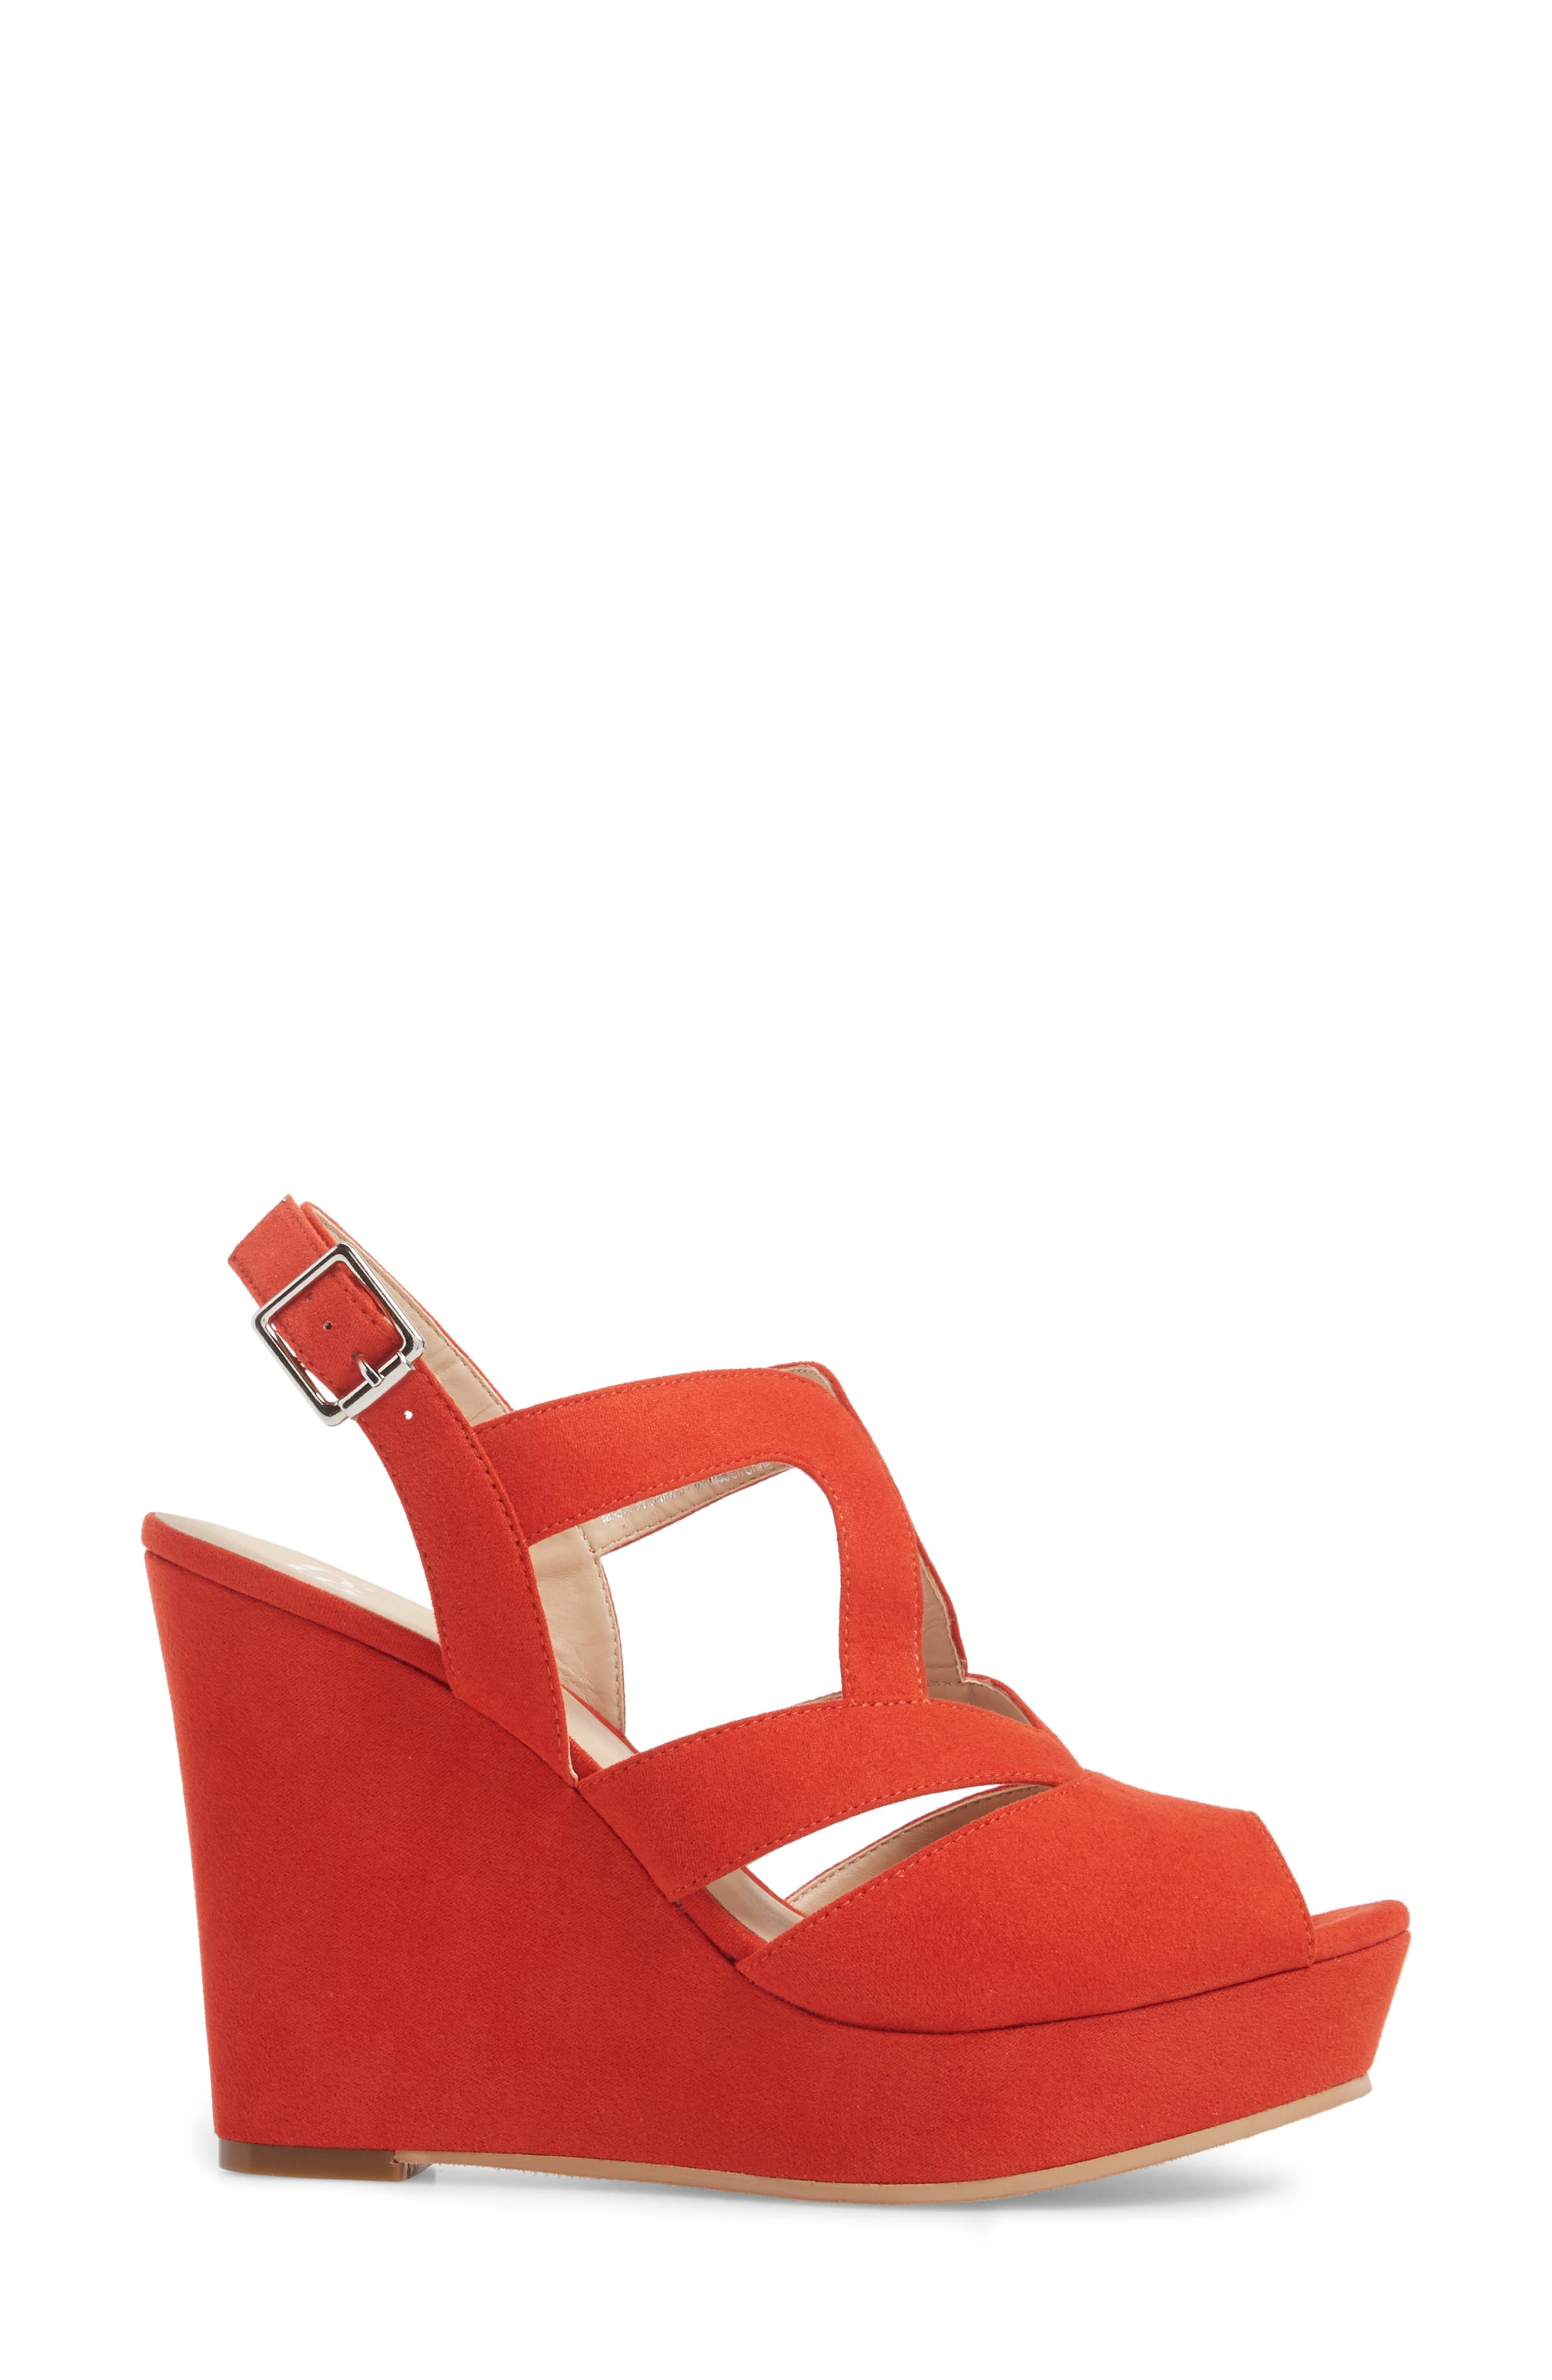 Sunny Platform Wedge Sandal,                             Alternate thumbnail 18, color,